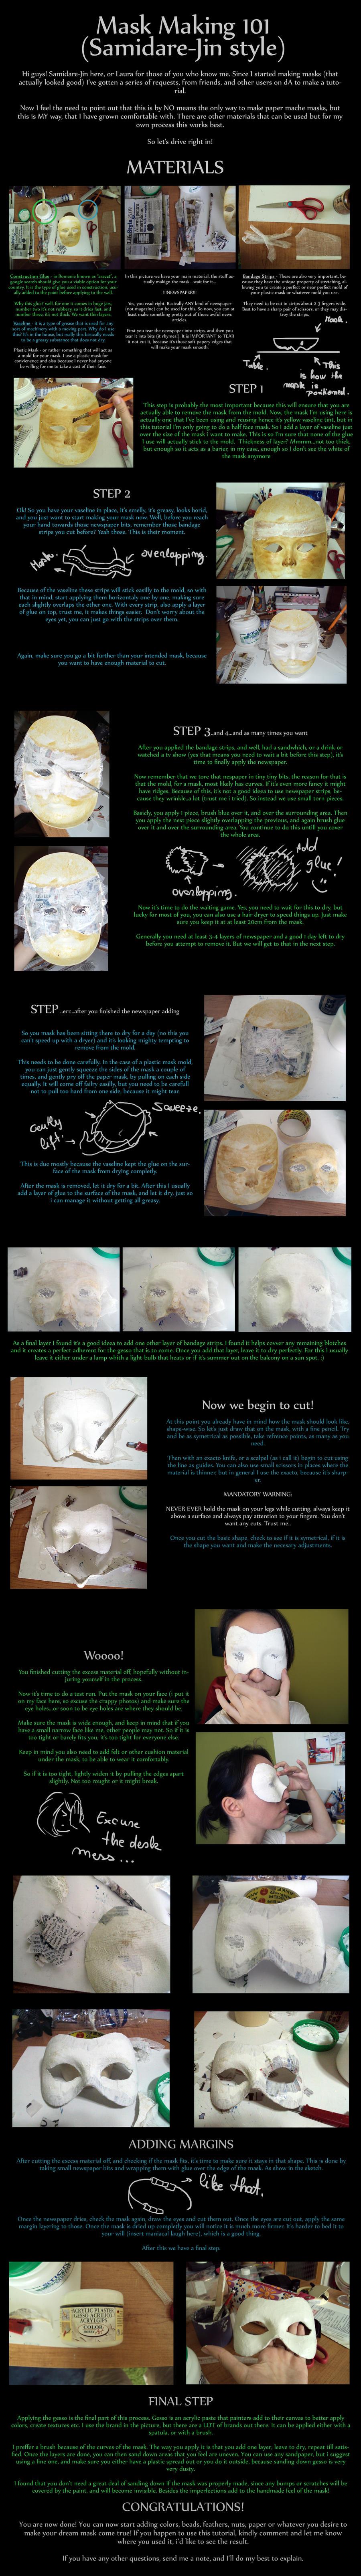 Mask Making Tutorial by Samidare-Jin